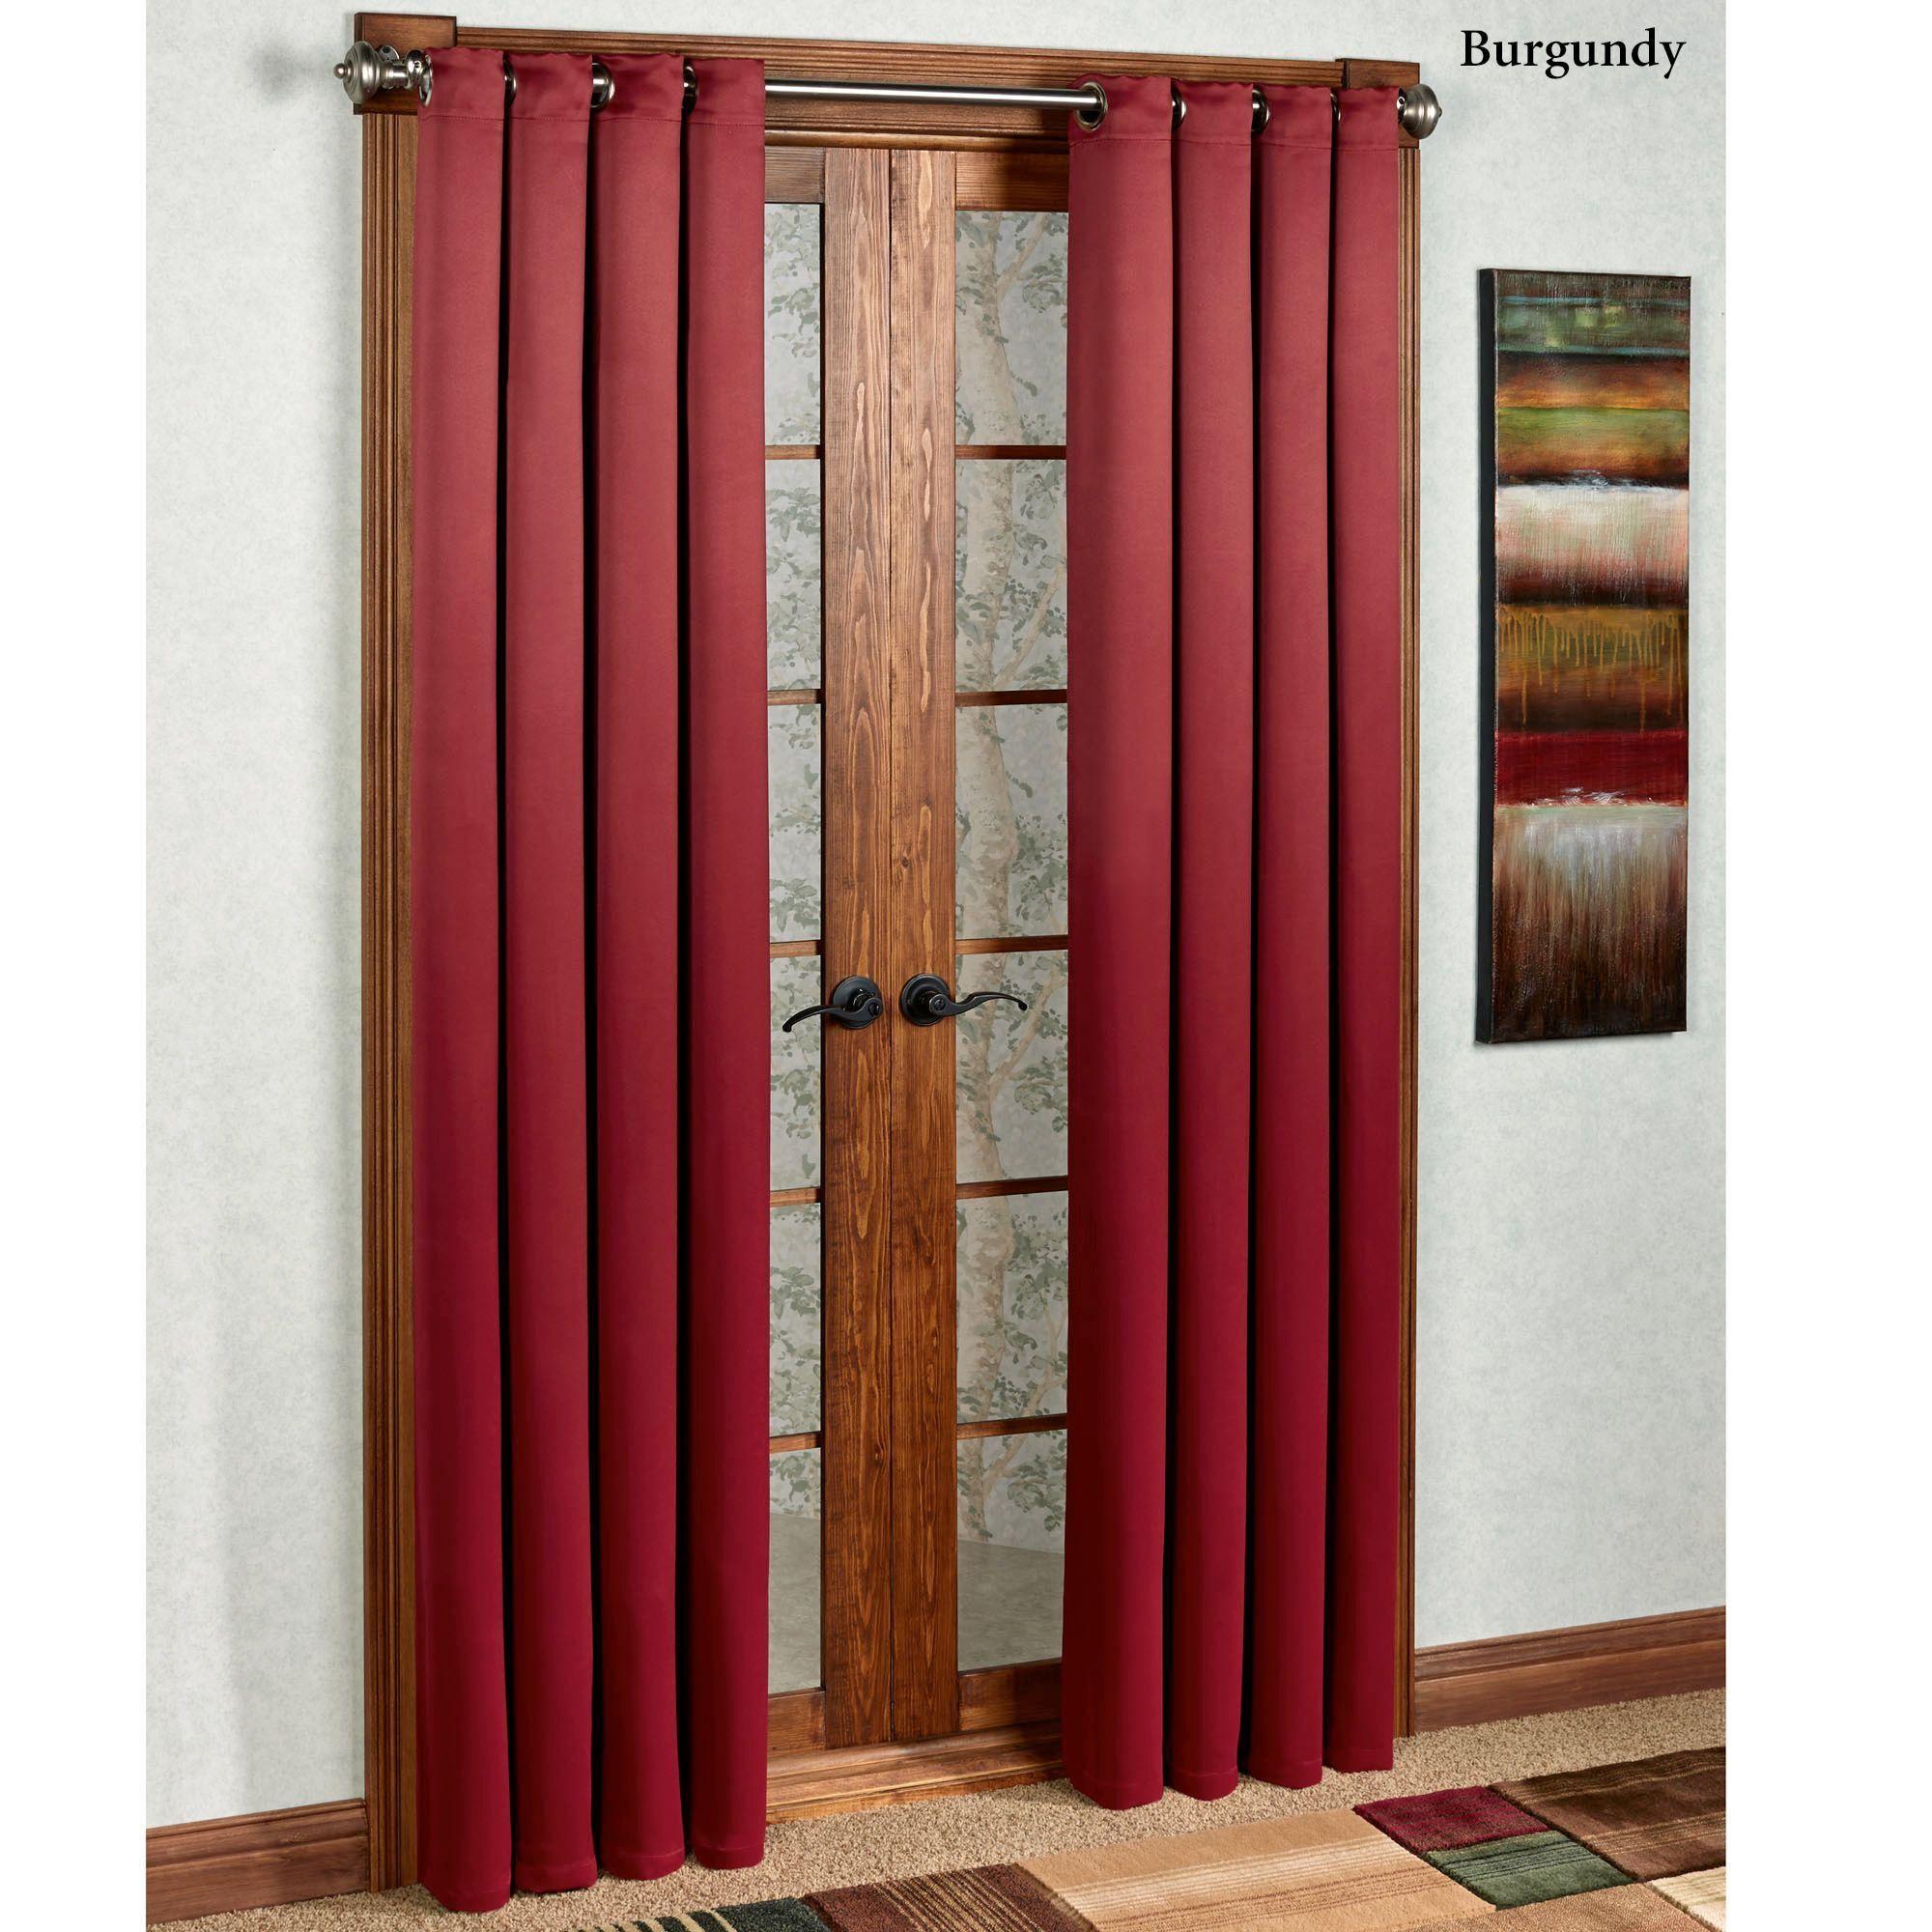 Carnivale heavyweight blackout grommet curtain panels